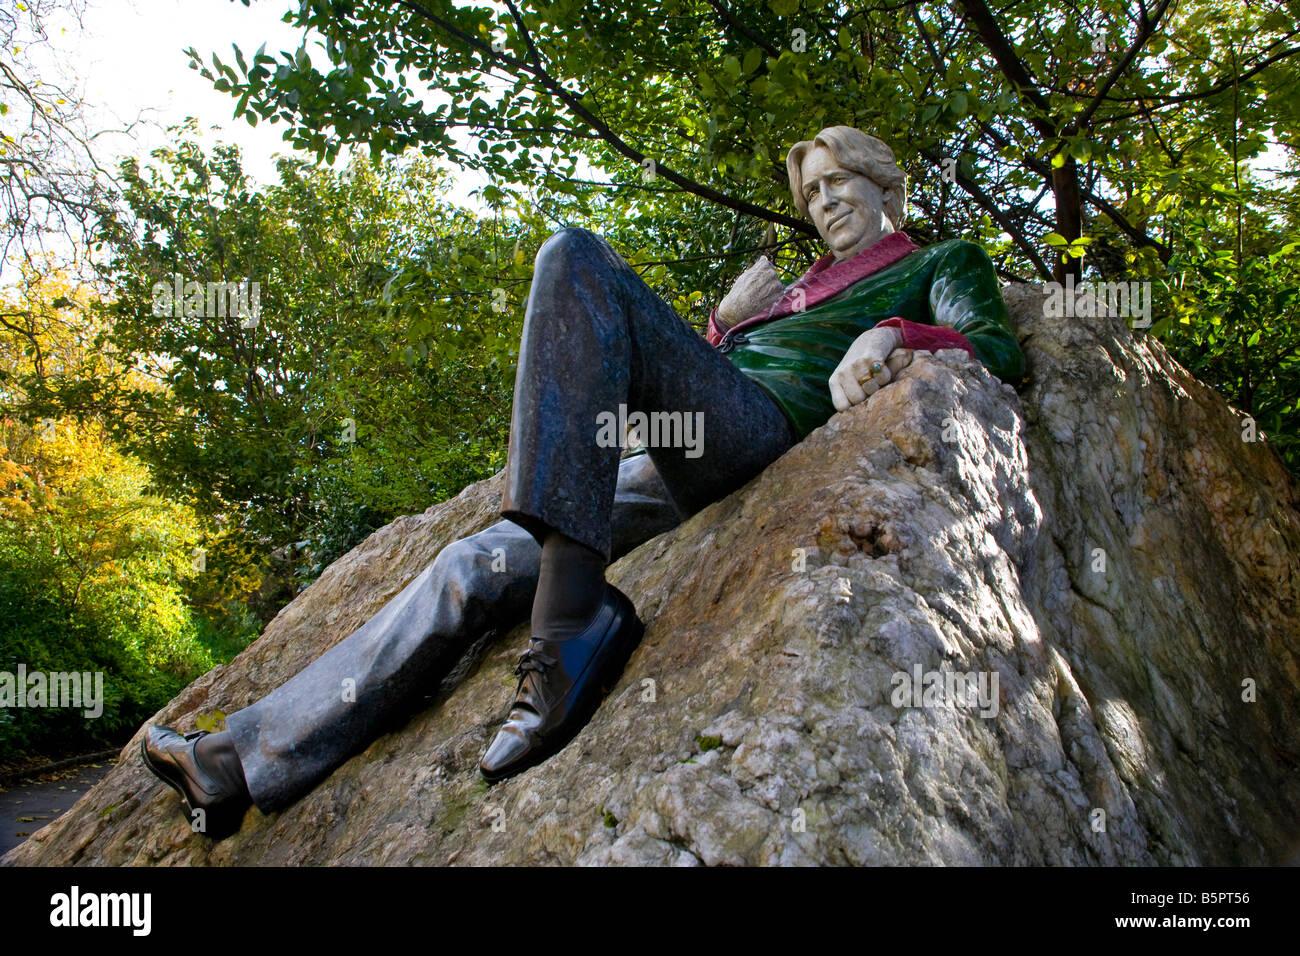 Staue Of Oscar Wilde Merrion Square Dublin Ireland